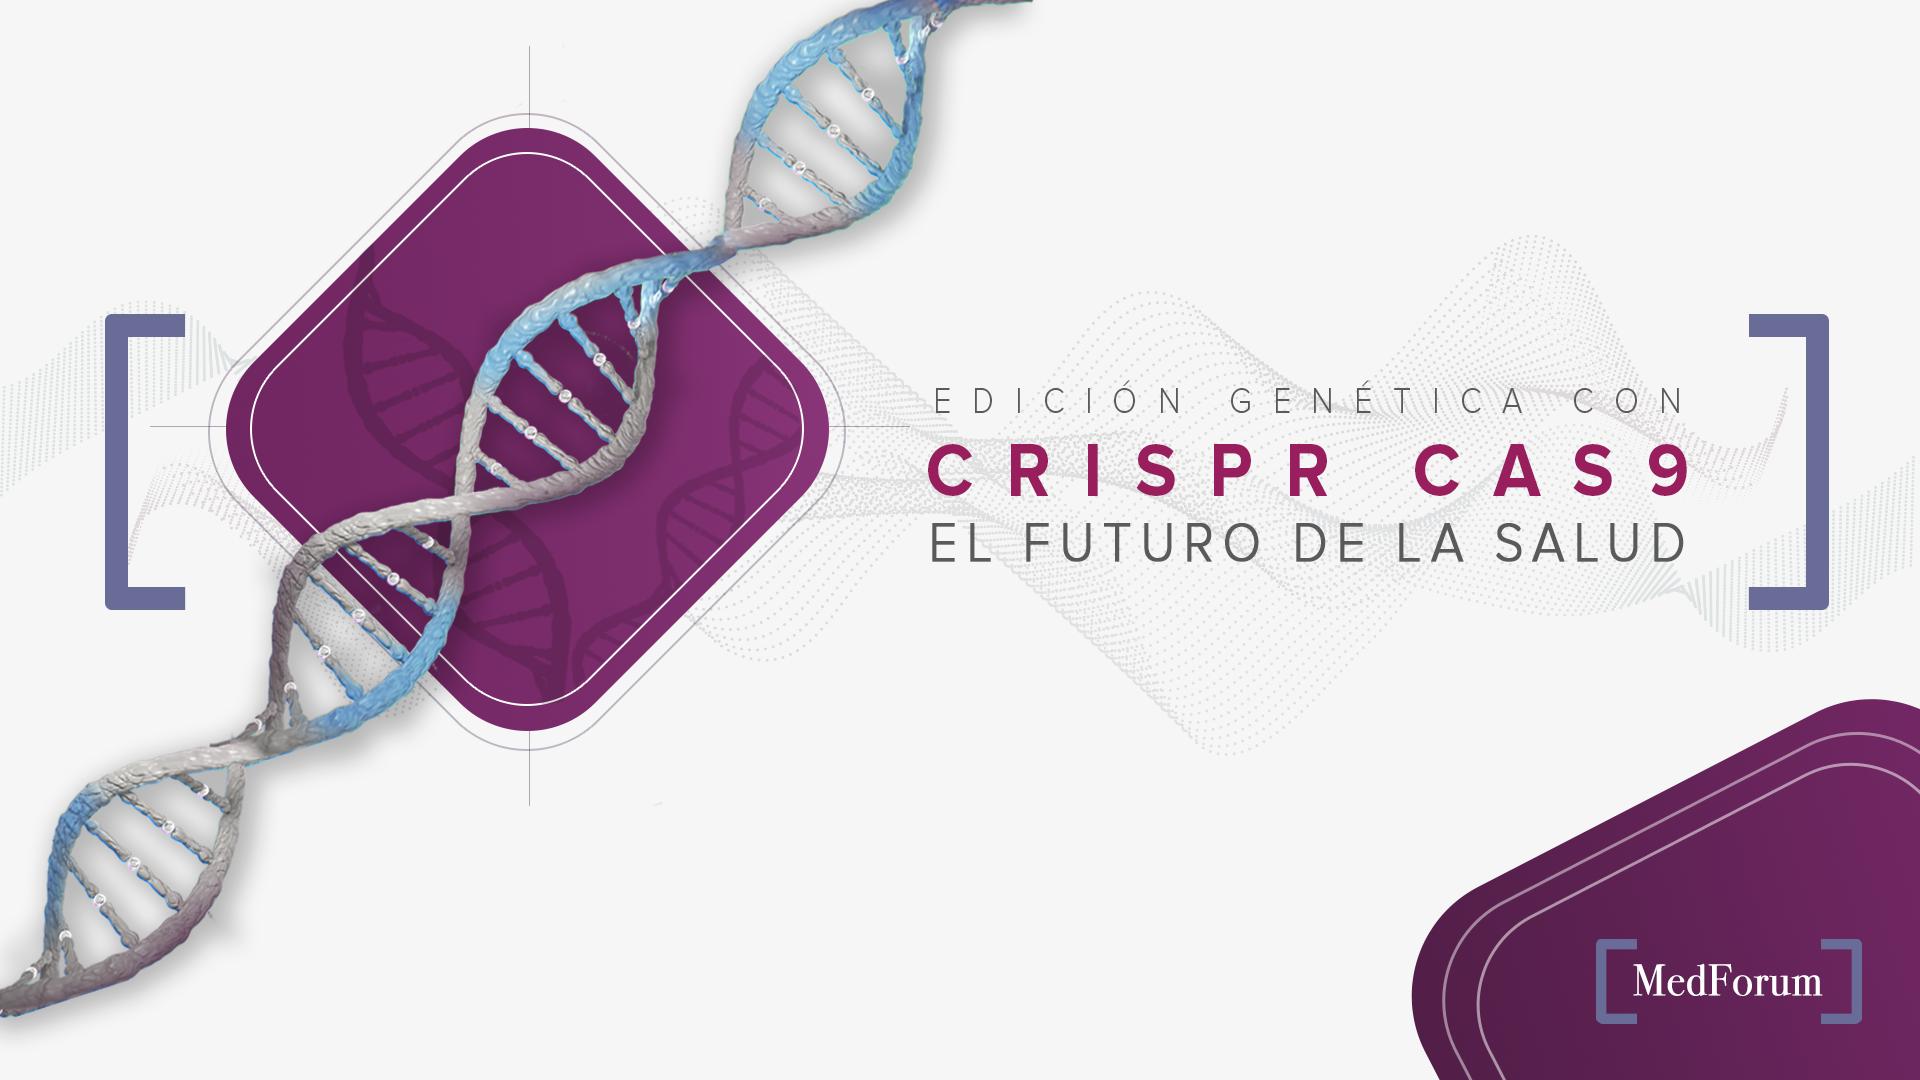 CRISPR: La herramienta biotecnológica del futuro